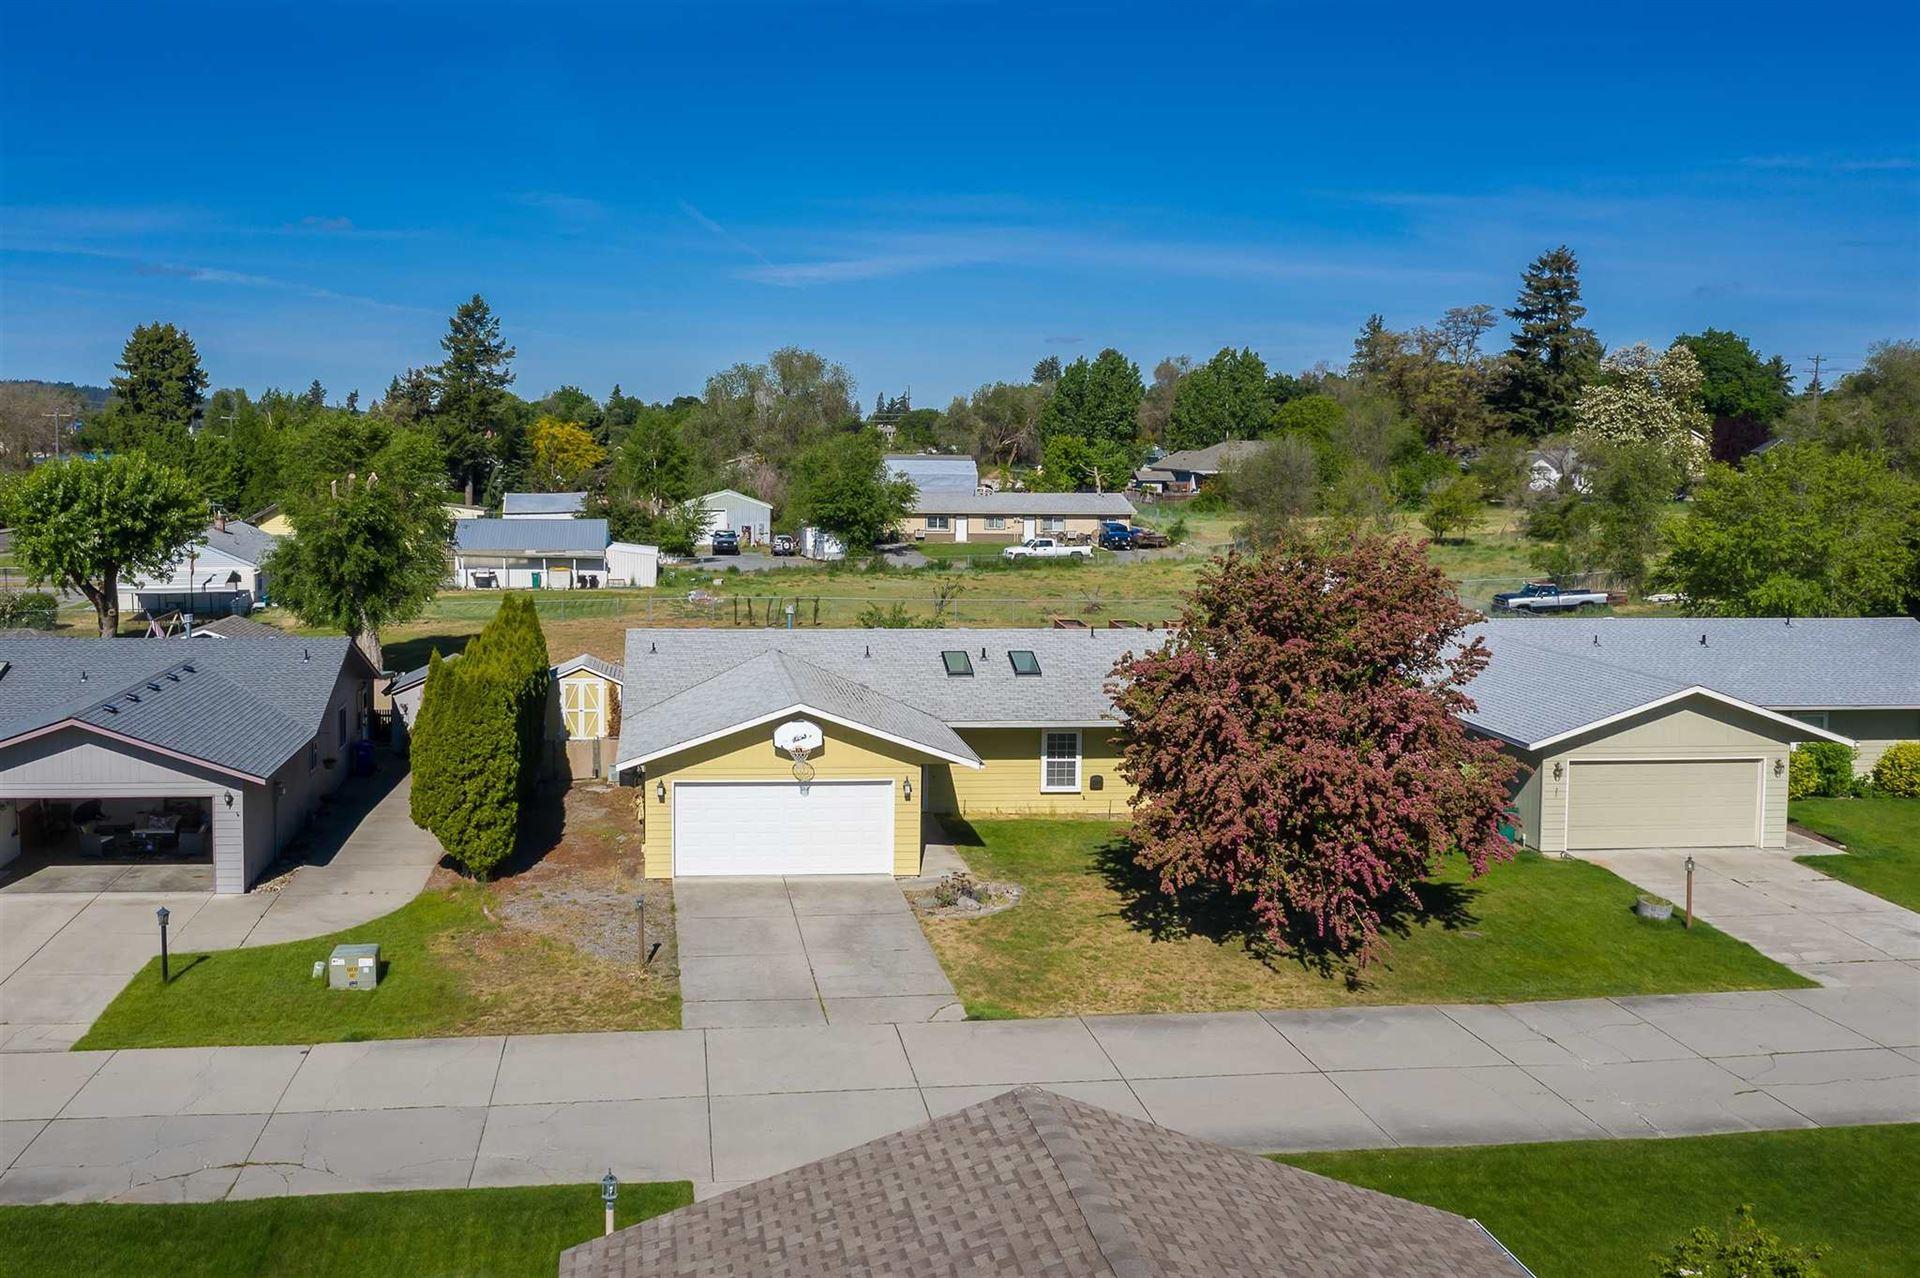 219 N Woodlawn Rd, Spokane Valley, WA 99216 - #: 202116214